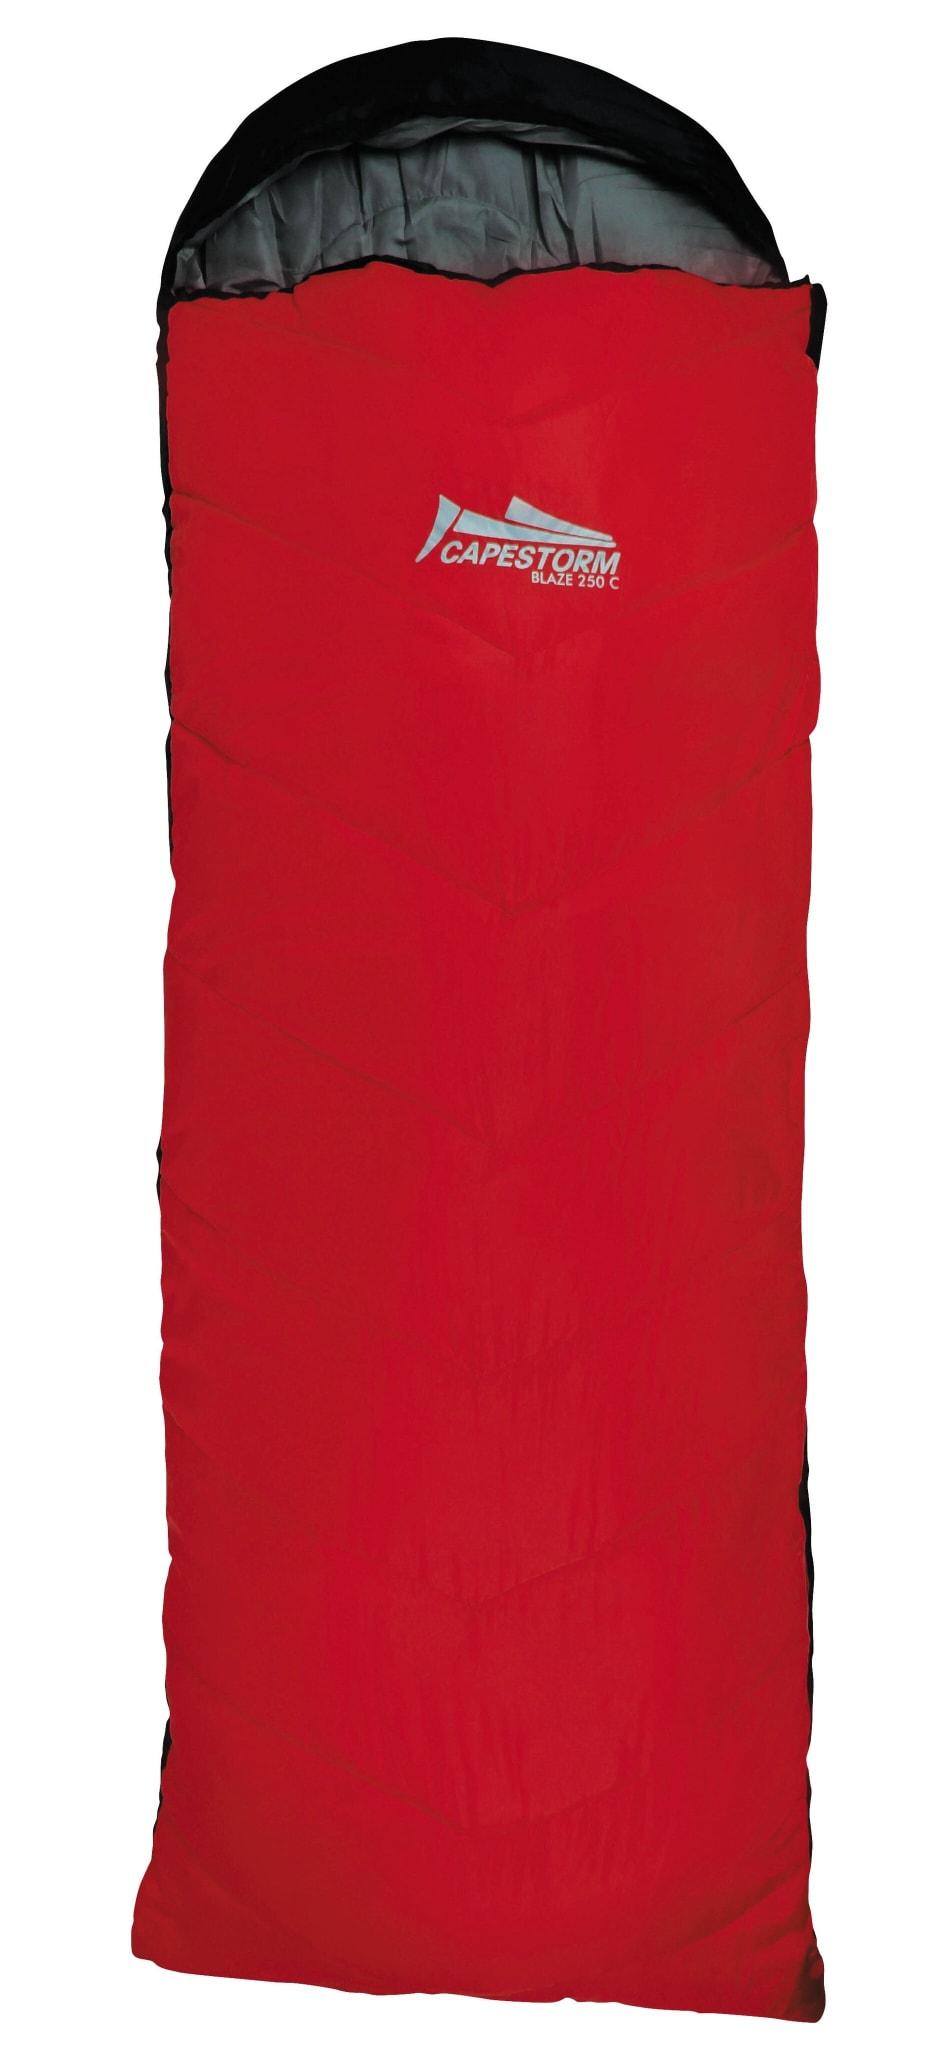 Capestorm Blaze 250 Cowl Sleeping Bag, product, variation 3